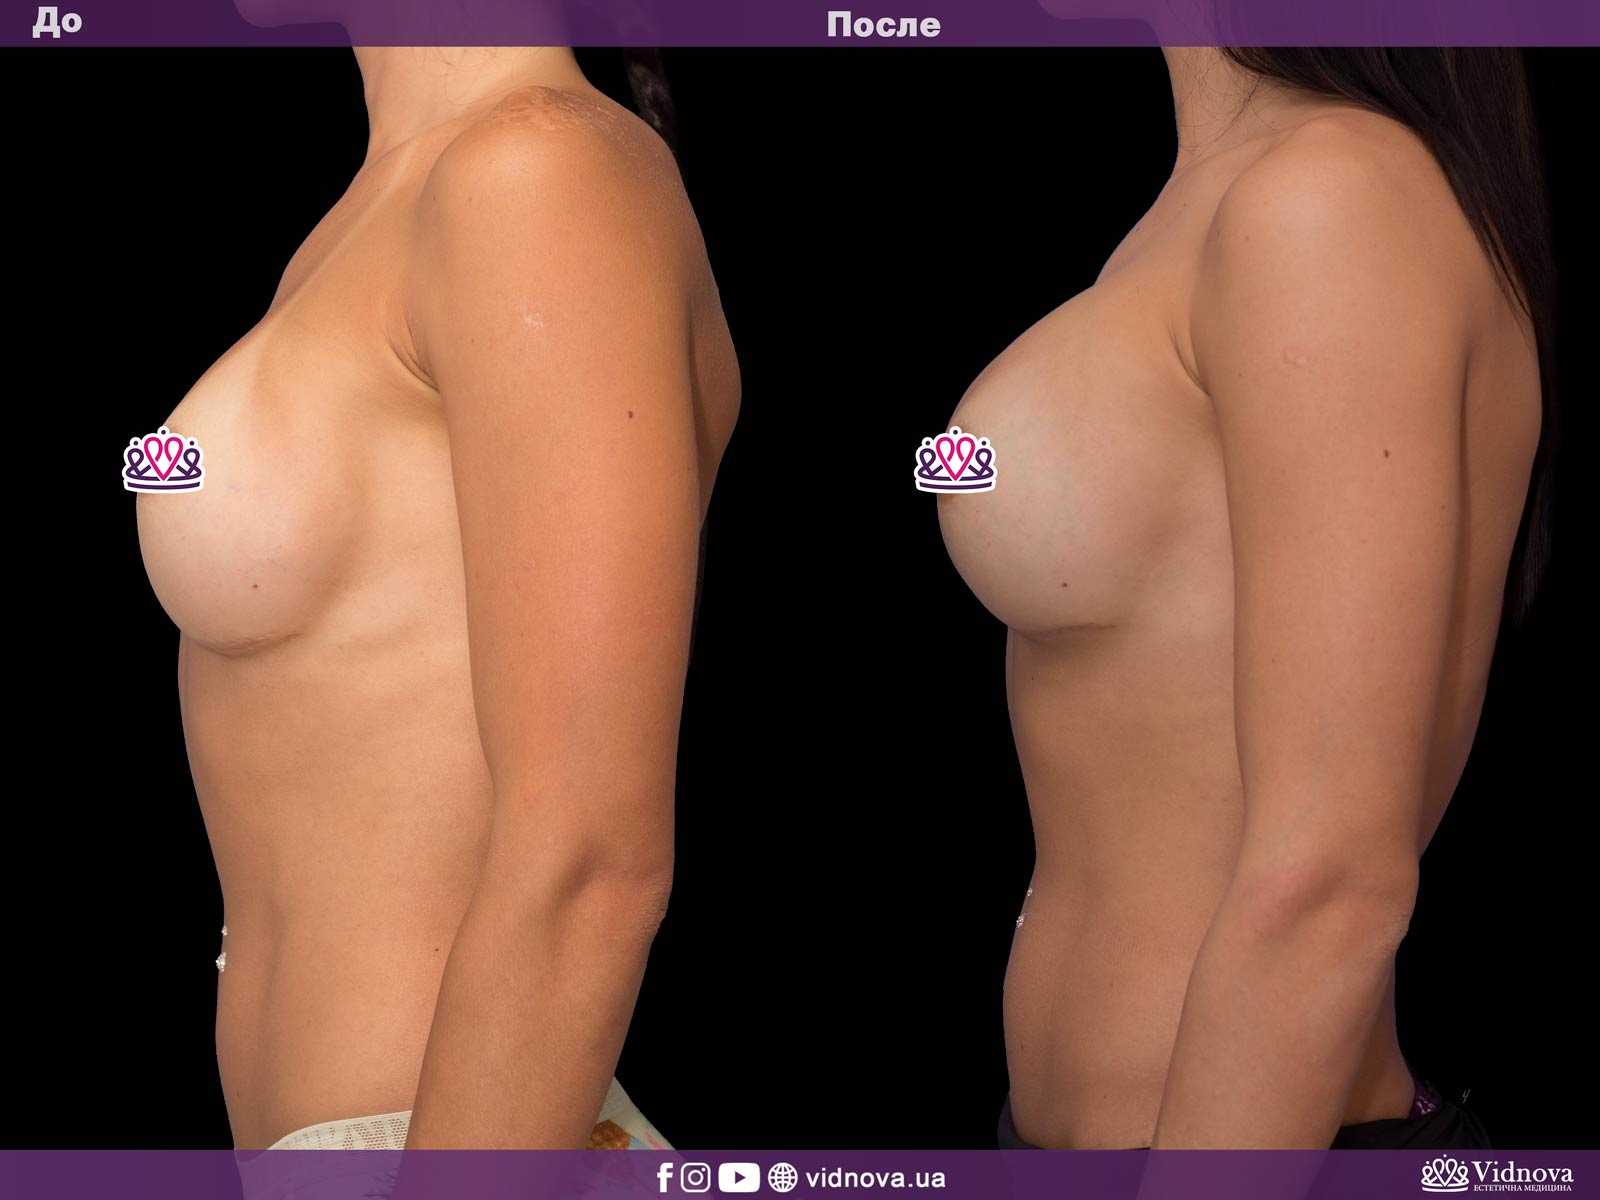 Увеличение груди: Фото ДО и ПОСЛЕ - Пример №33-3 - Клиника Vidnova